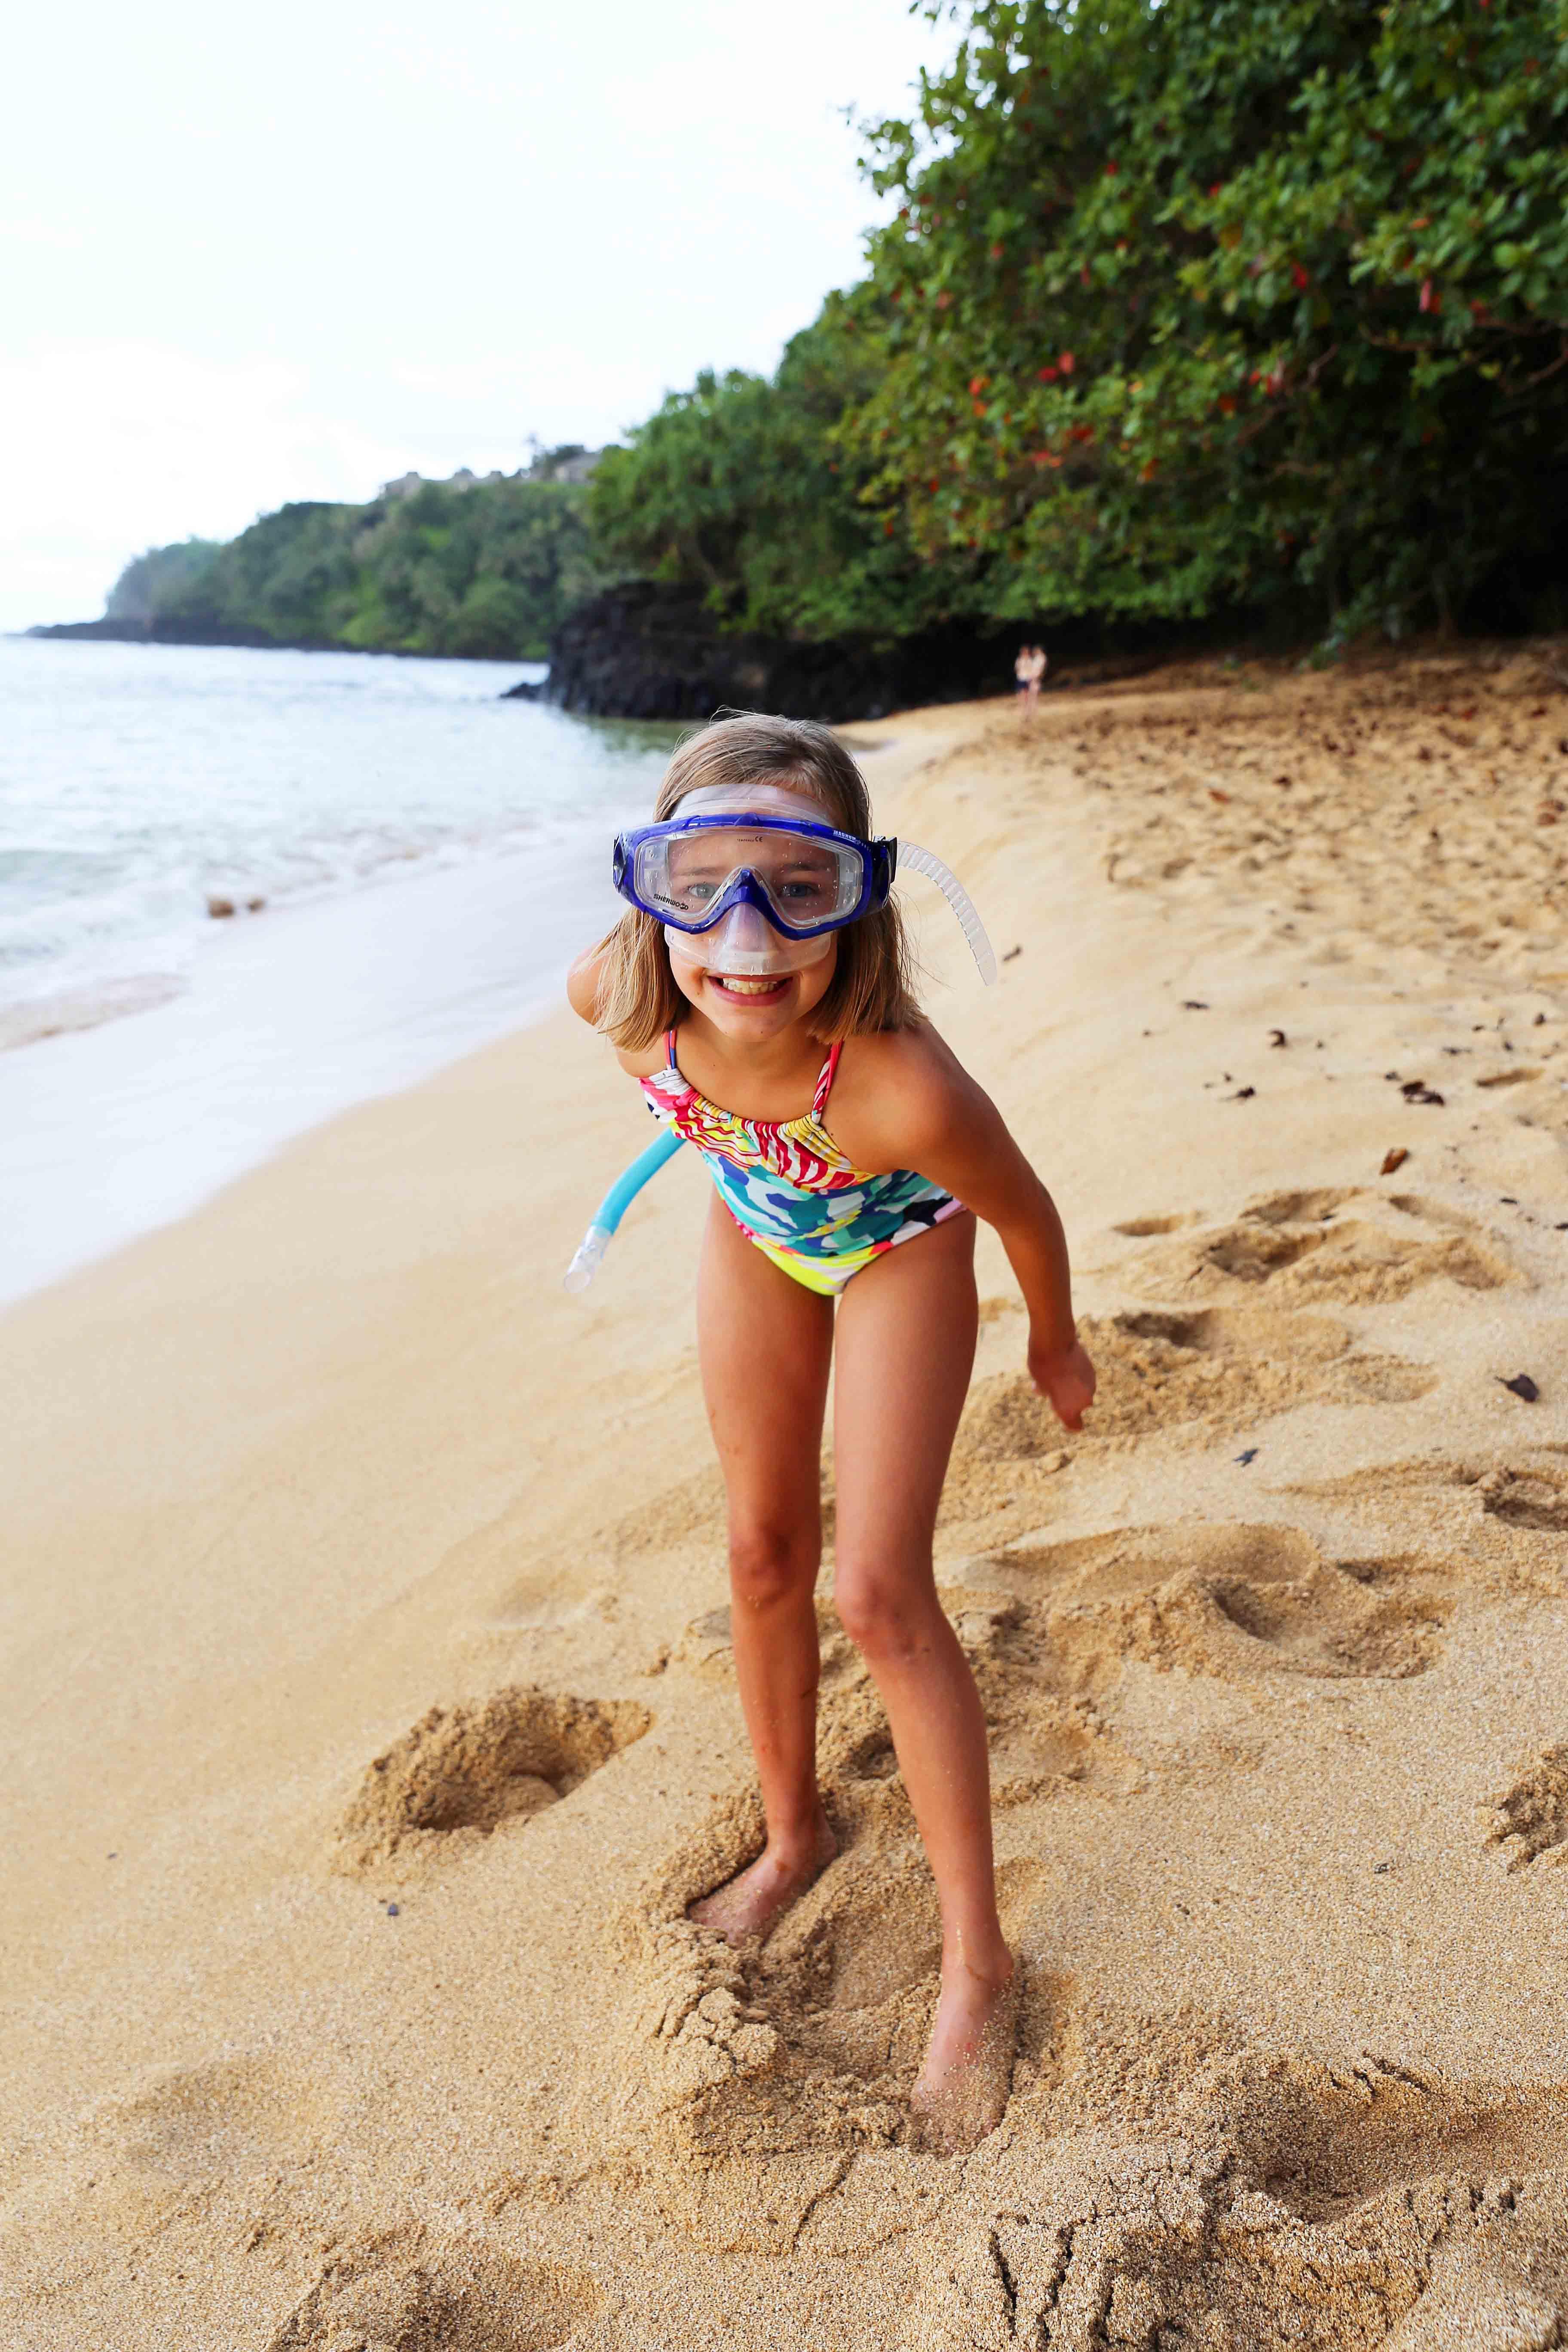 Kauai Hawaii Travel Guide. Snorkeling at Hideway Beach Kauai Hawaii